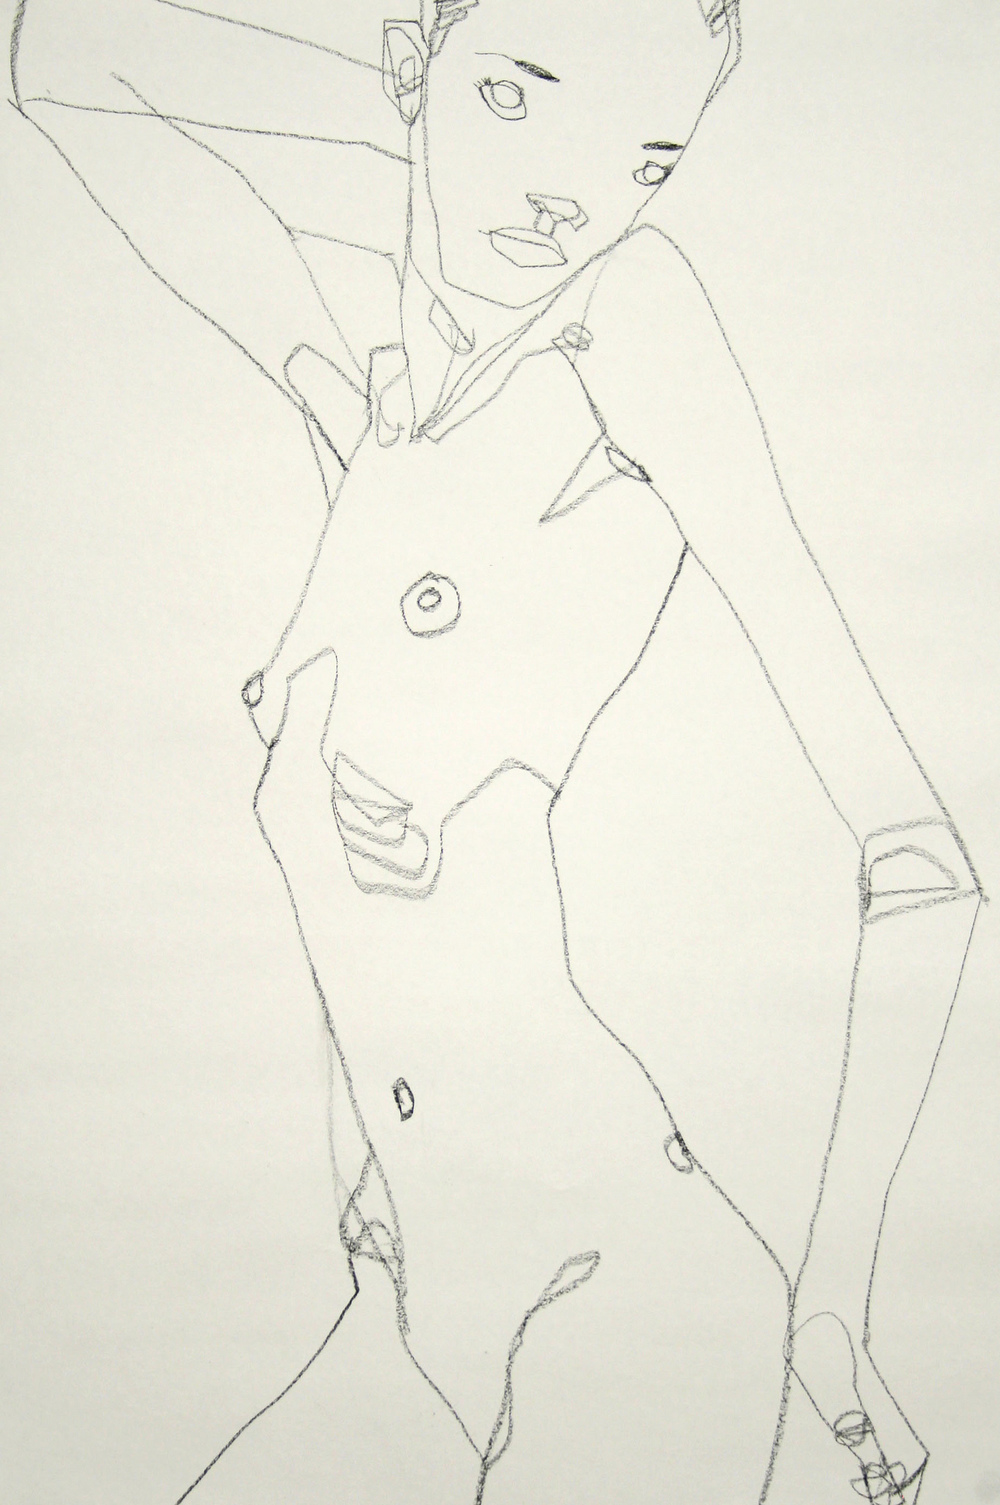 the-tree-mag-drawings-by-lu-cong-140.jpg